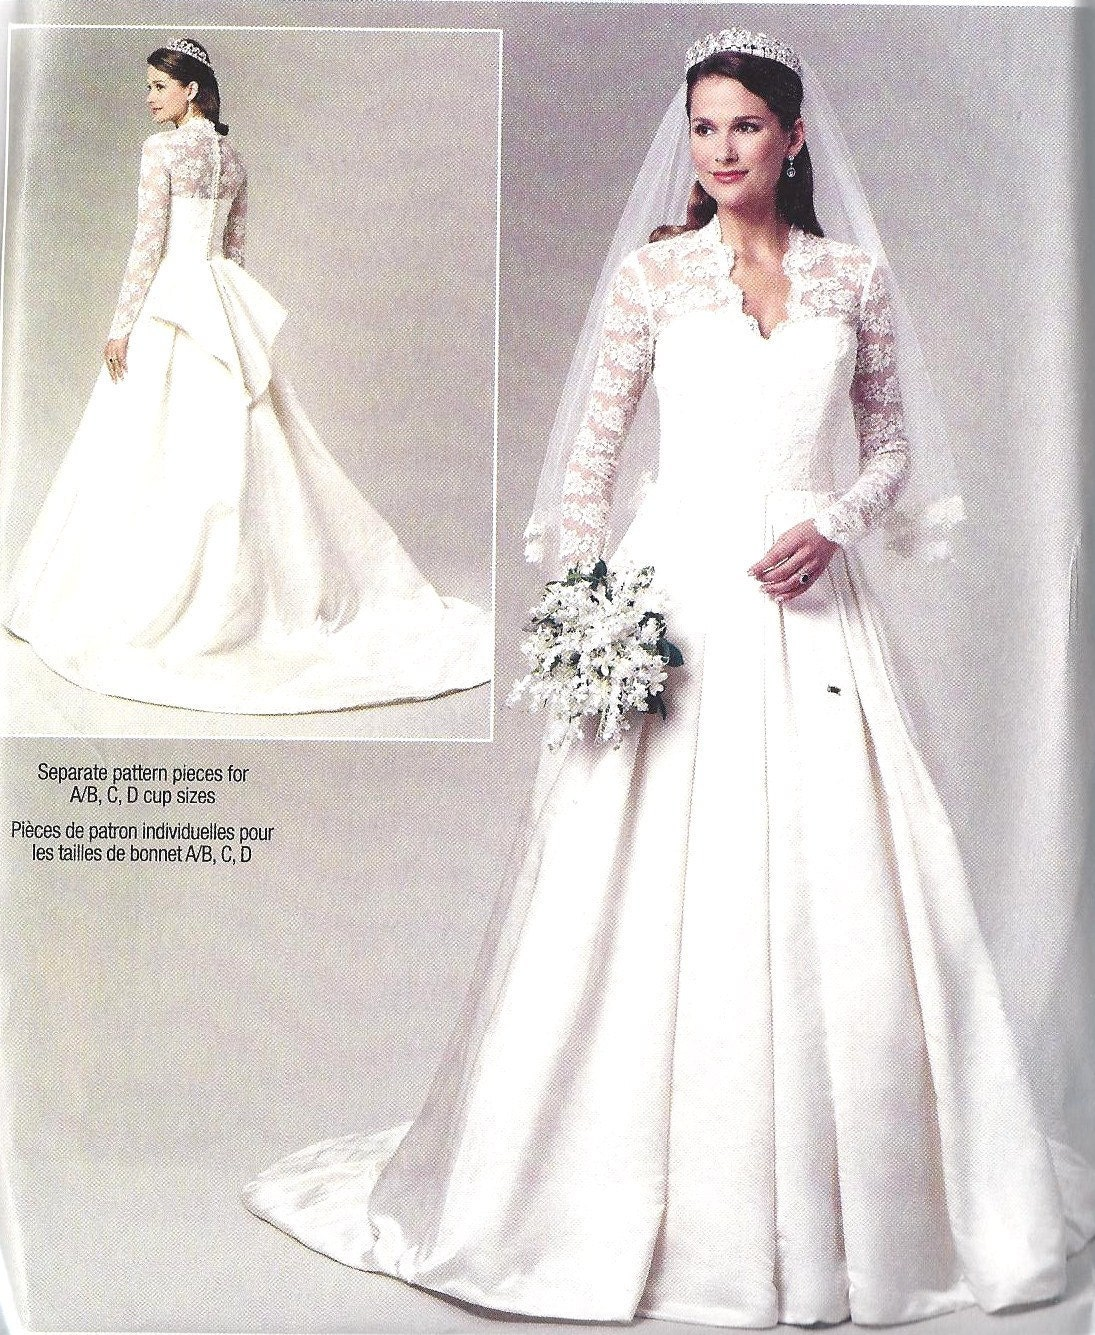 Wedding dress patterns plus size free wedding ideas for How to get a free wedding dress